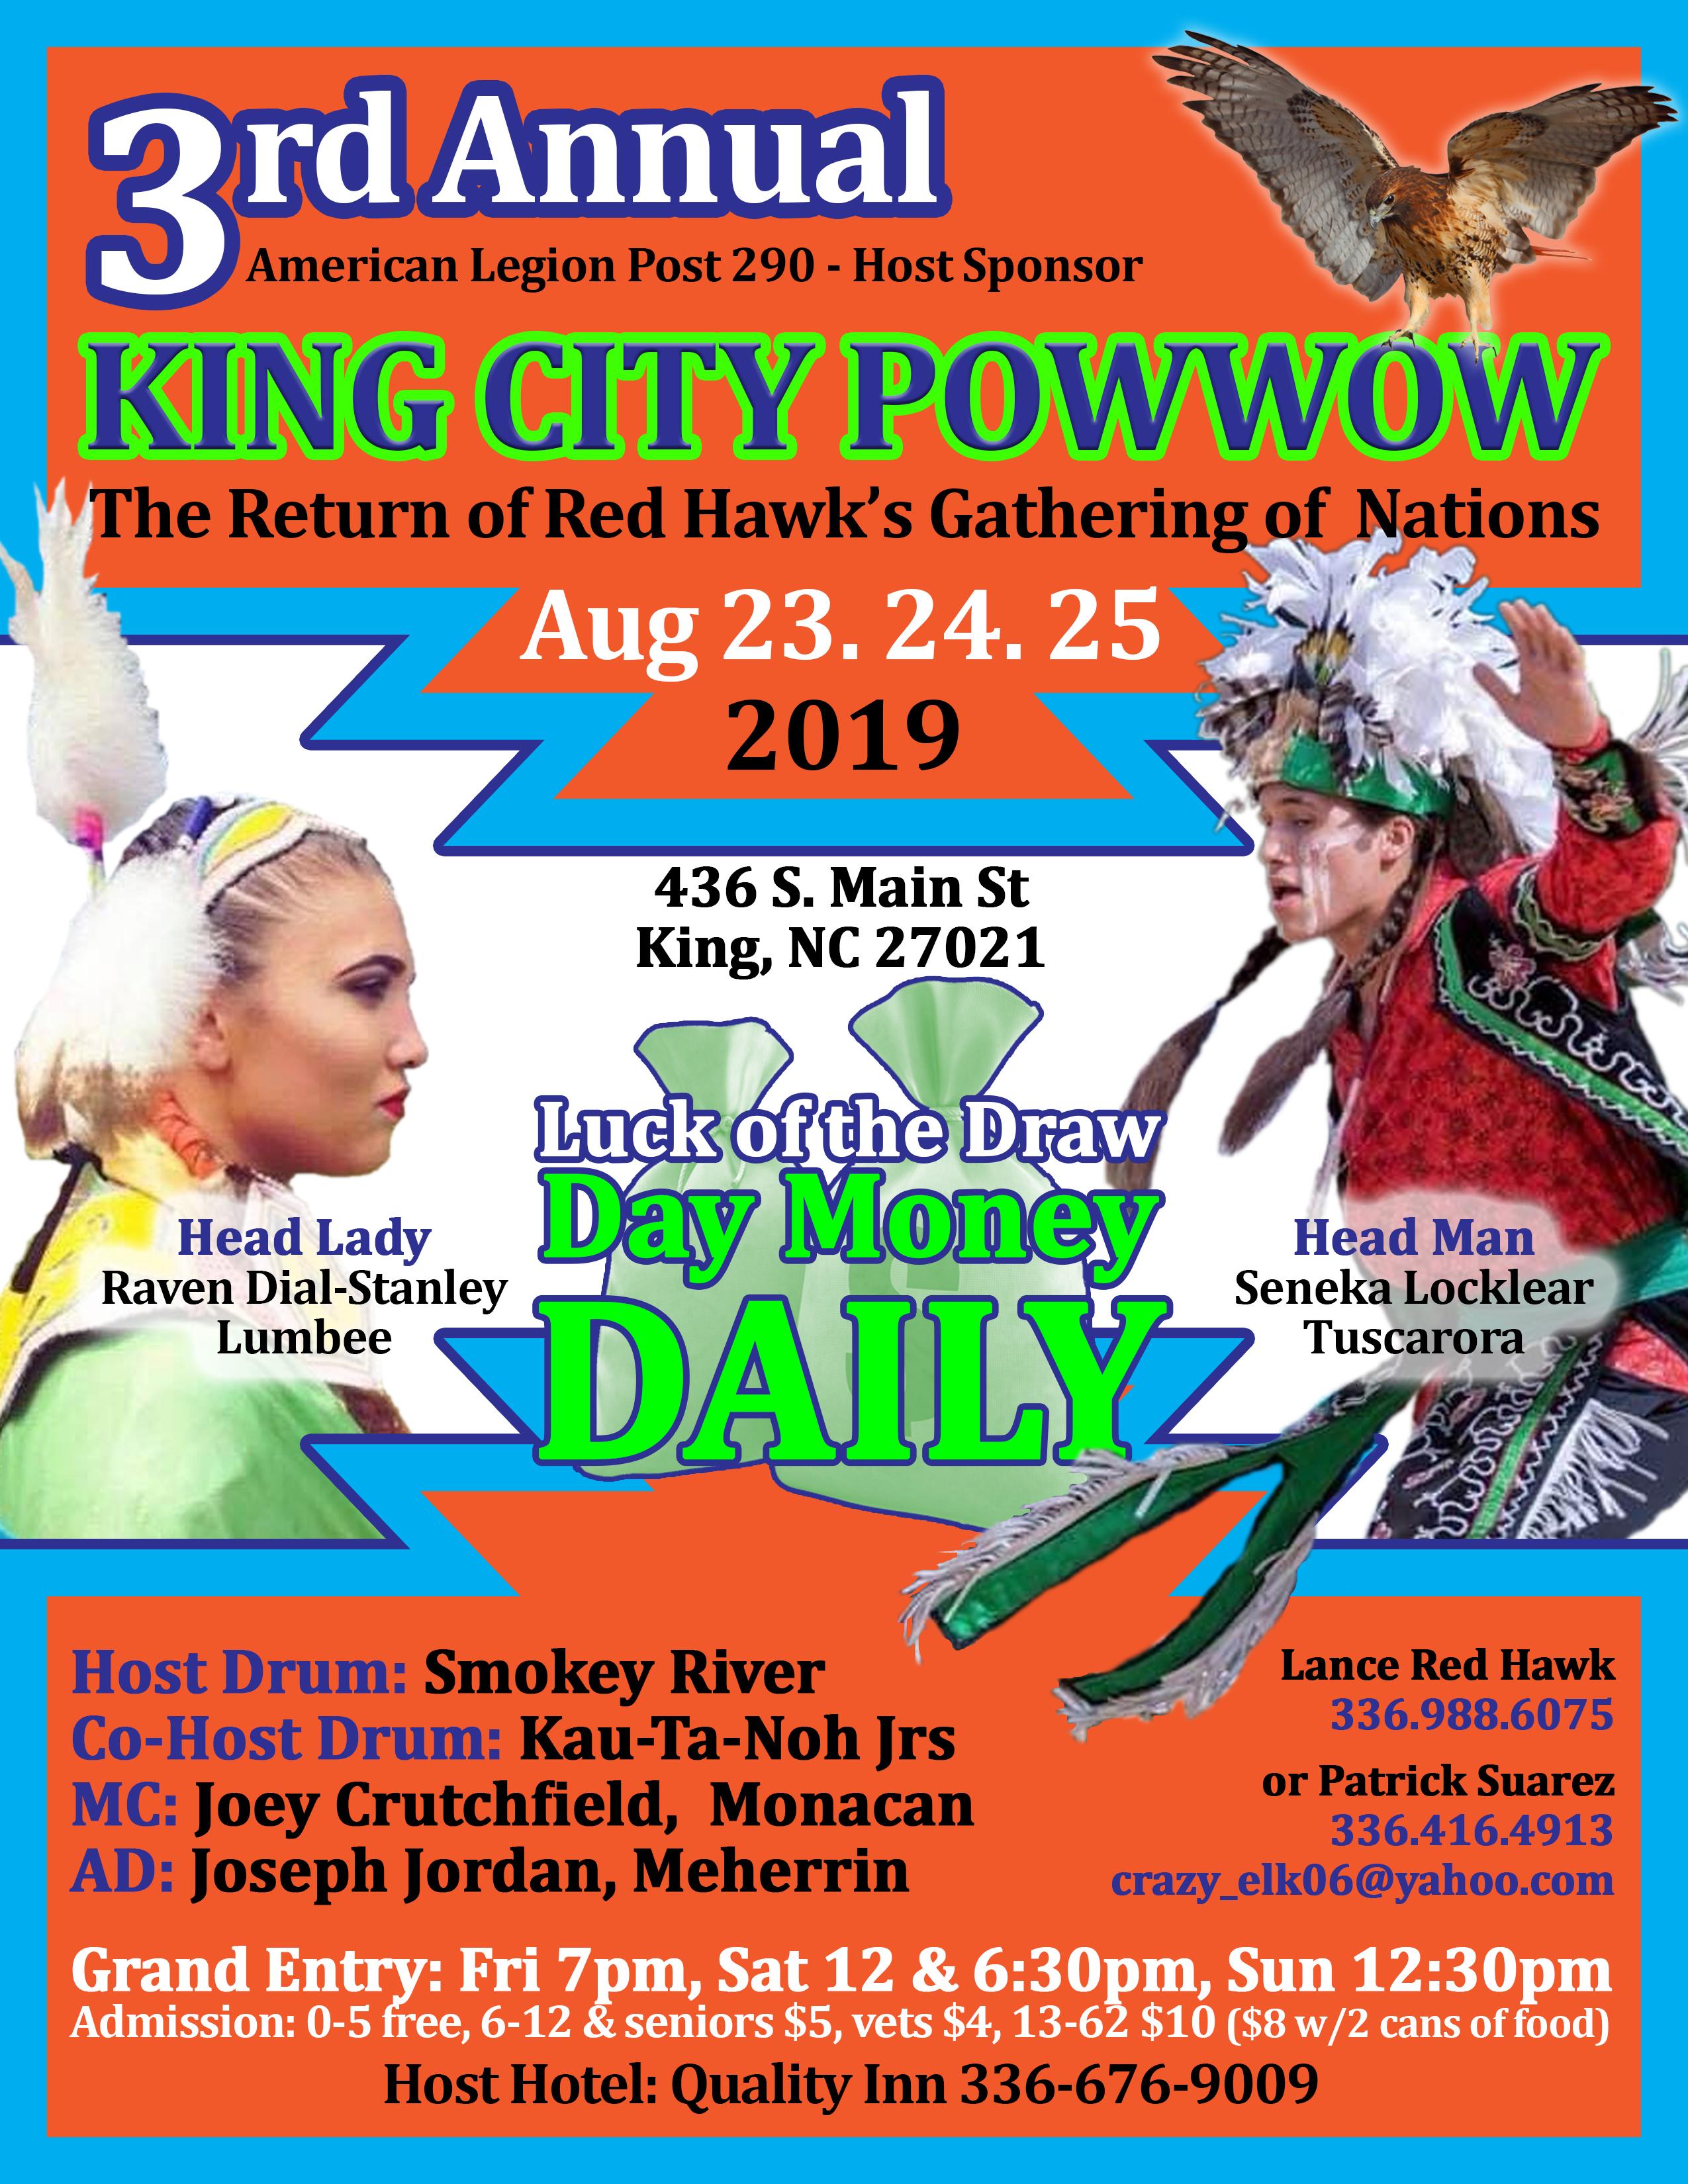 Redhawks Gathering of Nations King City Powwow